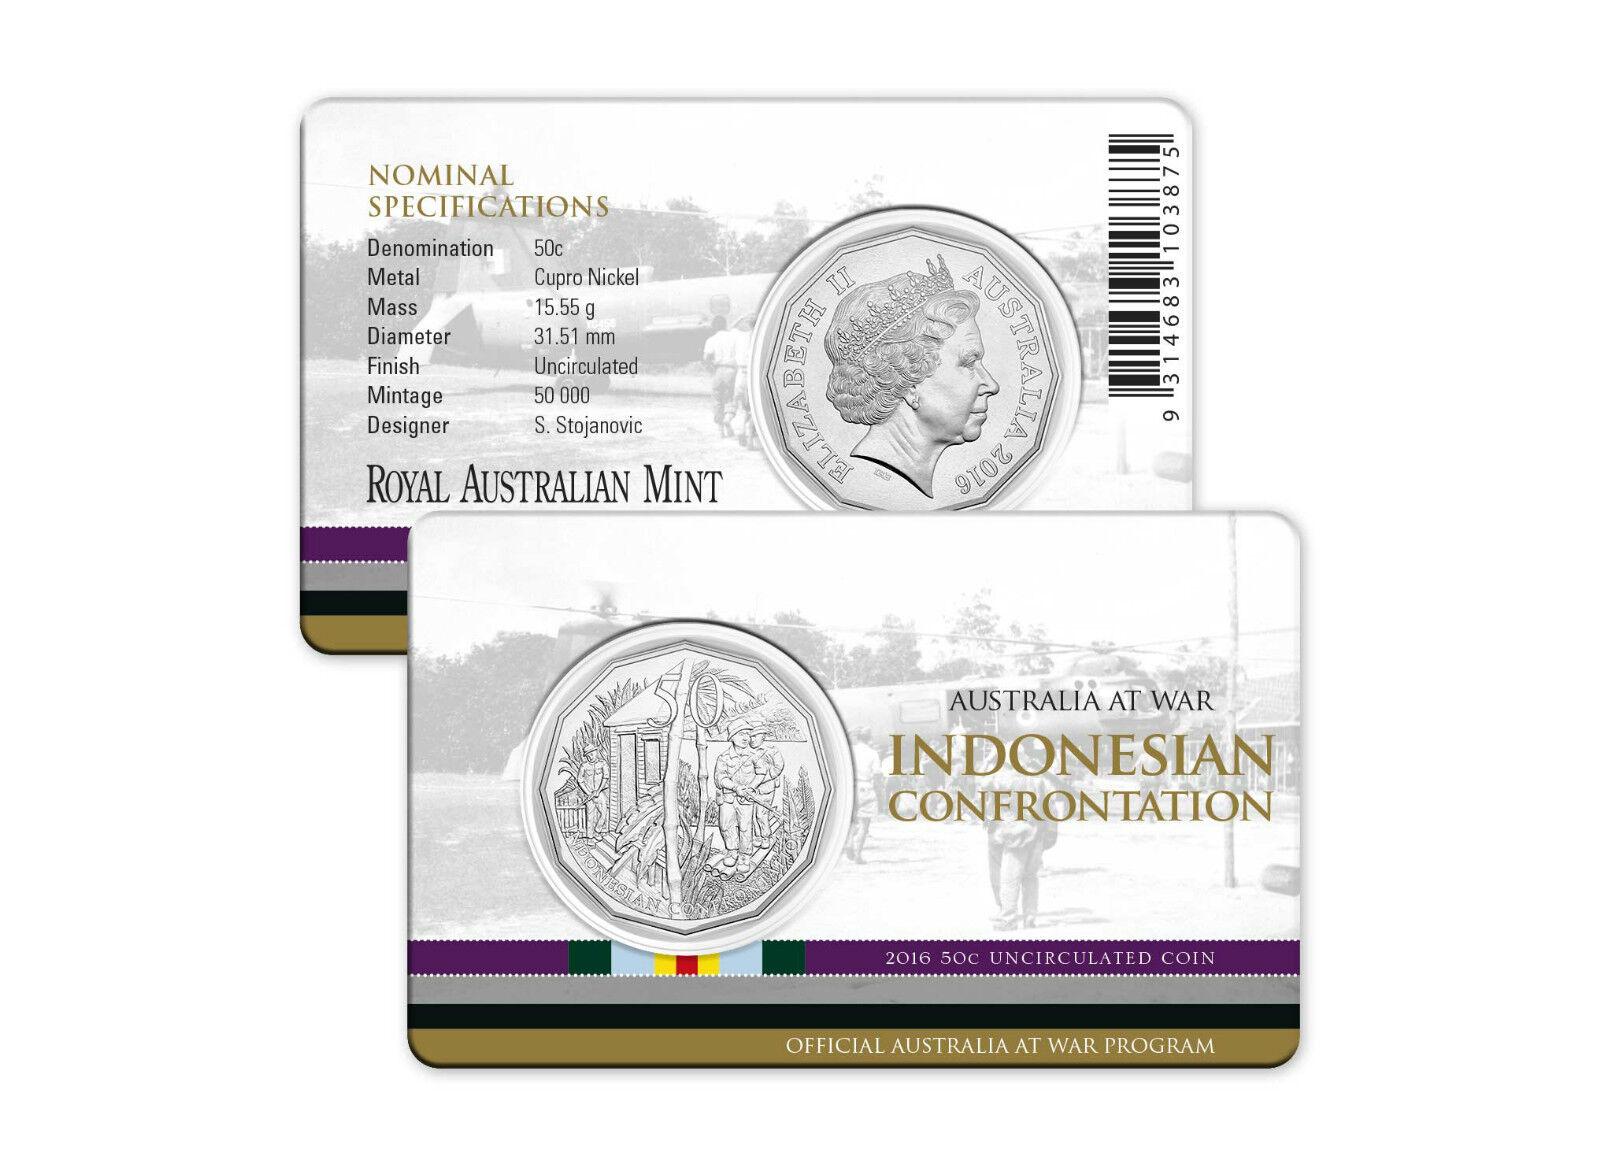 Indonesian Confrontation Australia at War 2016 RAM 50 cent UNC Coin